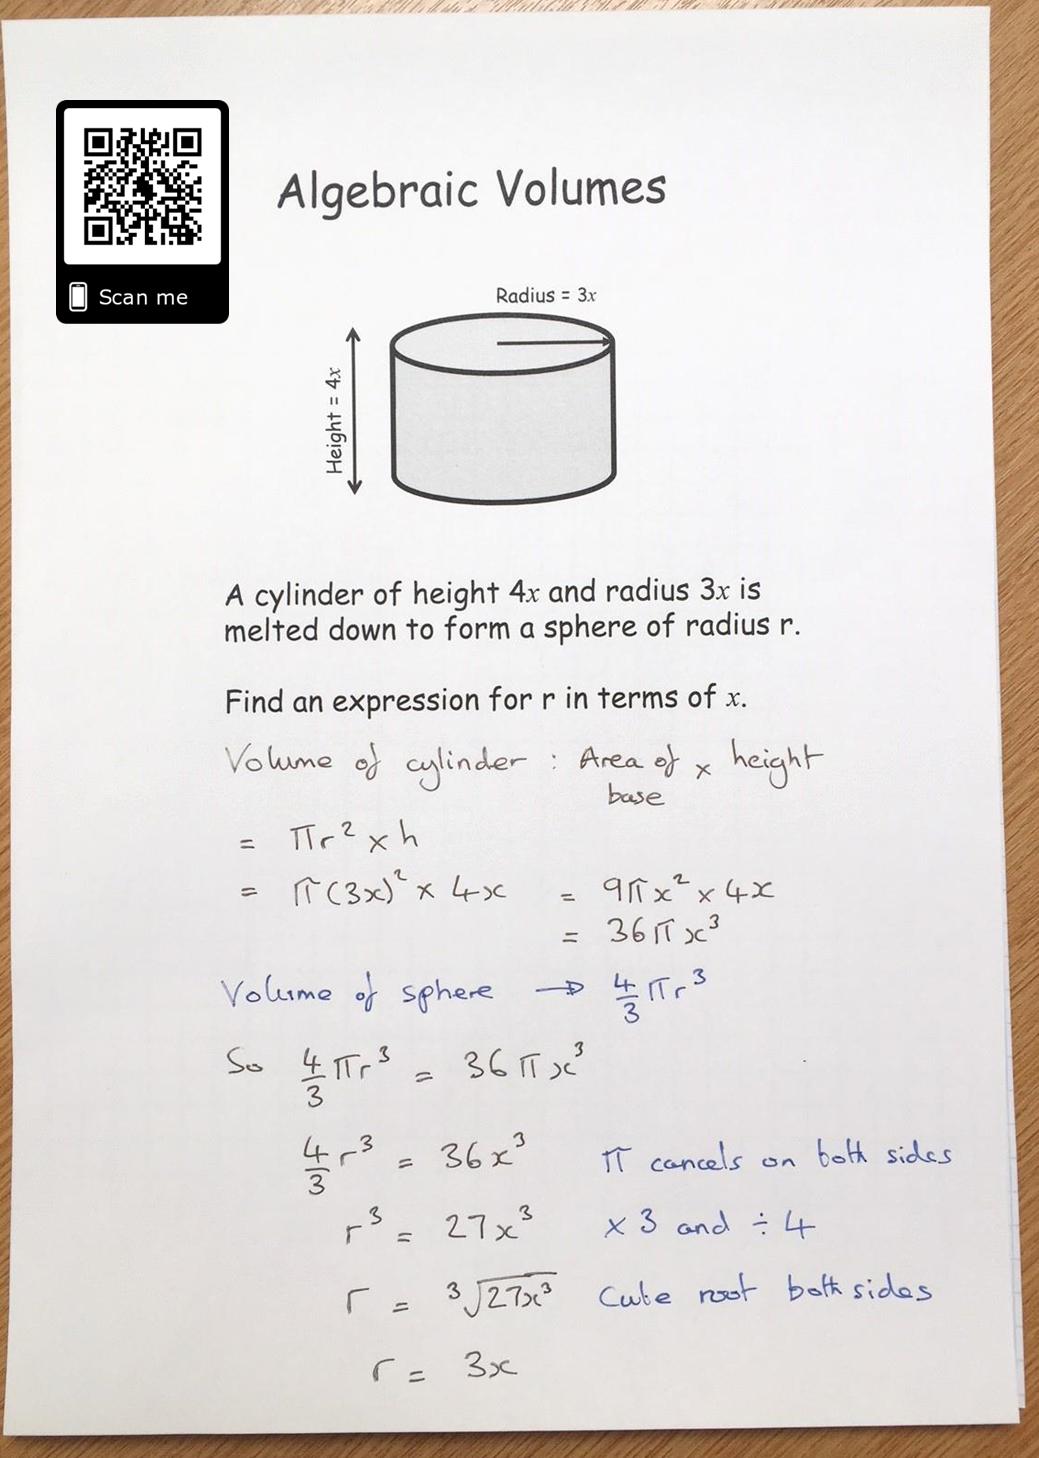 Algebraic Volume Problem